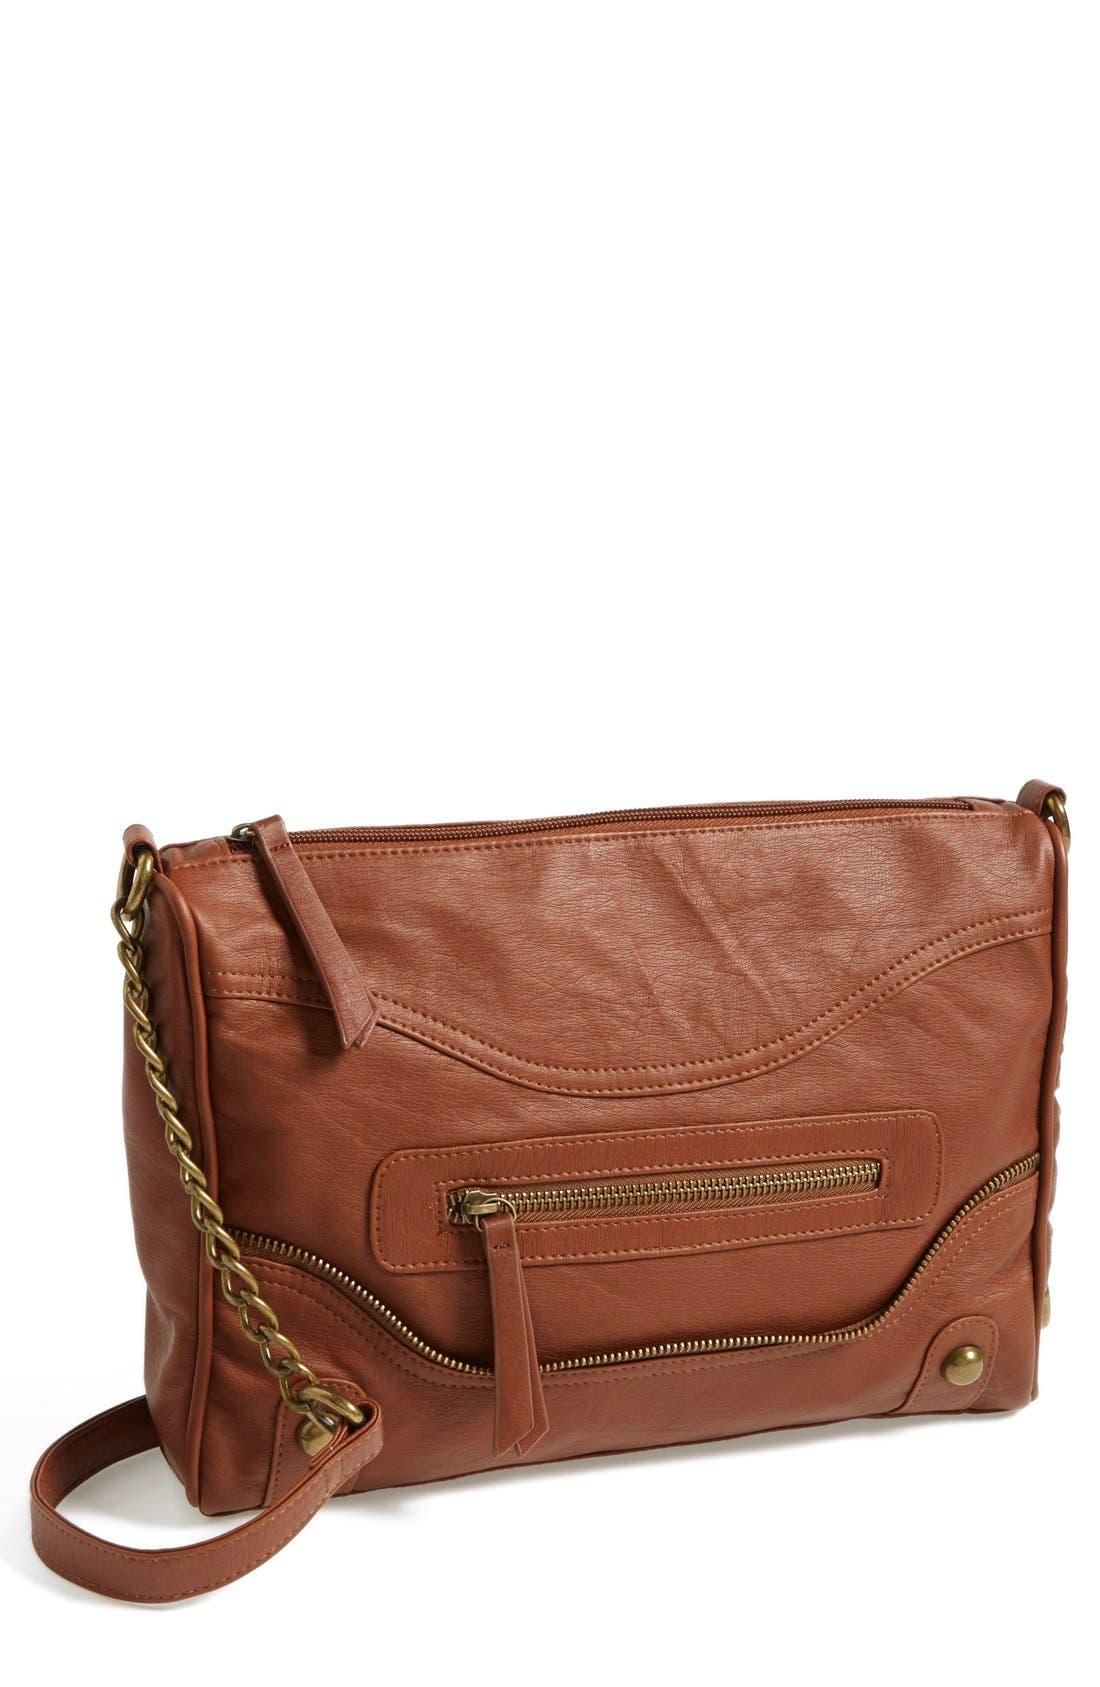 Alternate Image 1 Selected - KENDALL + KYLIE Madden Girl Zip Detail Crossbody Bag (Juniors)